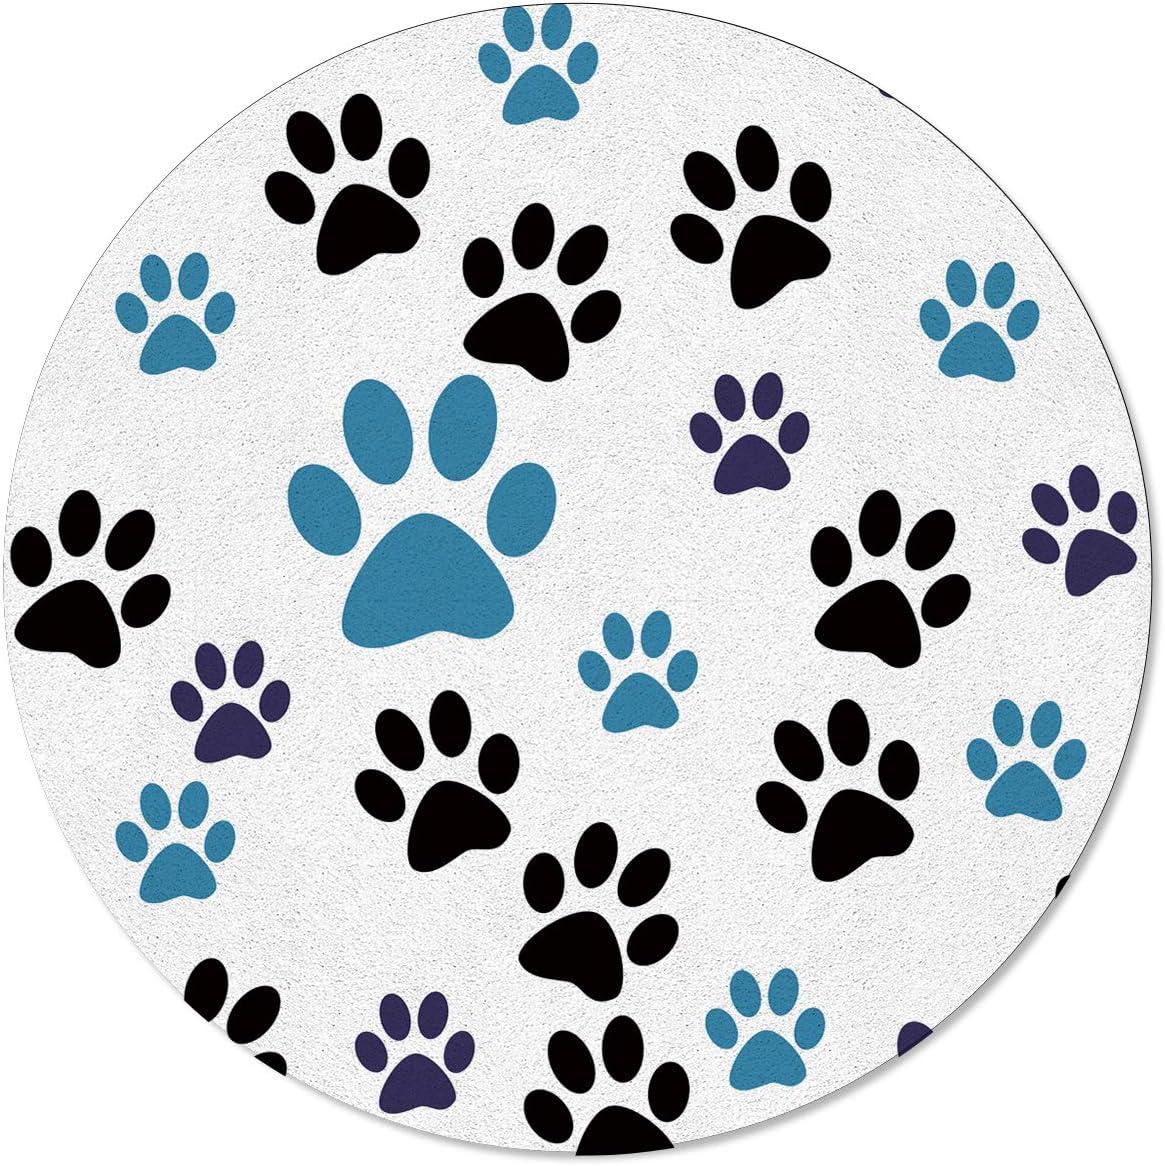 OneHoney Animal Dog's Paw Print Round 超定番 全品送料無料 3.3 Feet Rugs Indoor Area